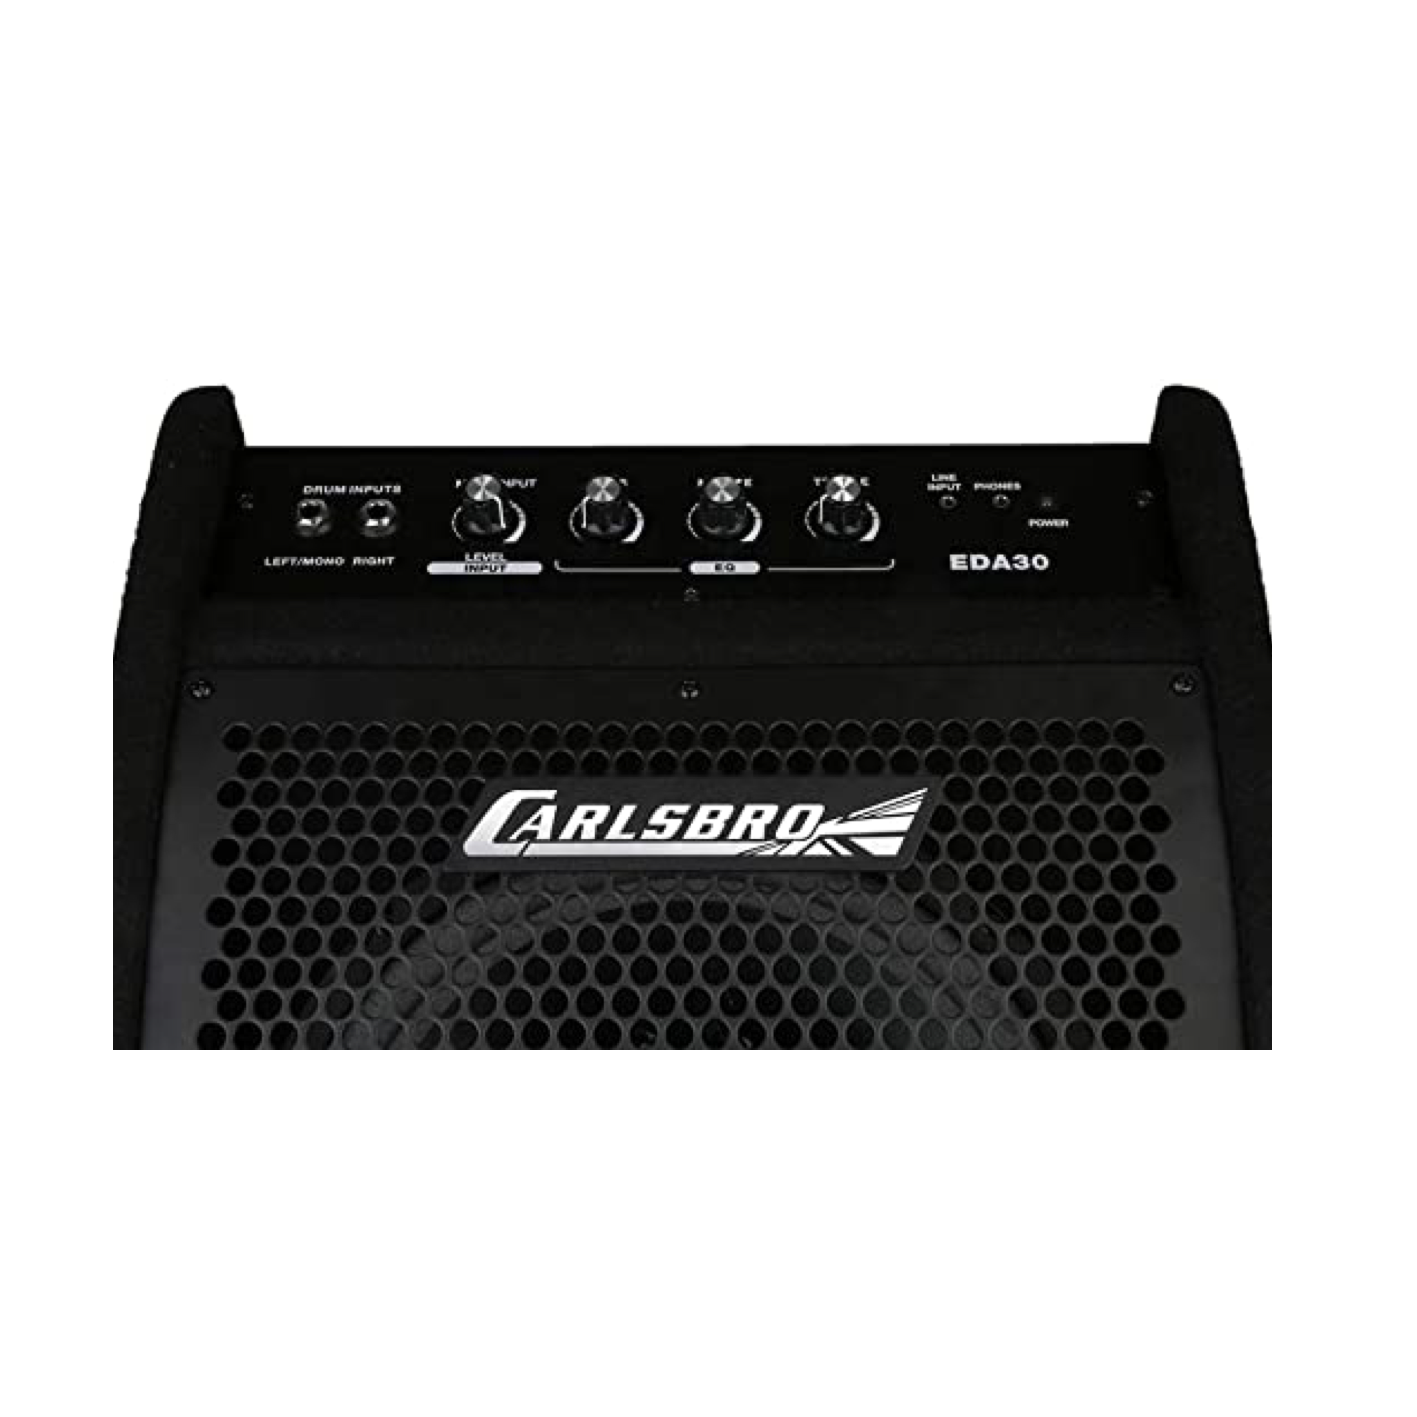 Carlsbro EDA30 30w Drum Amp